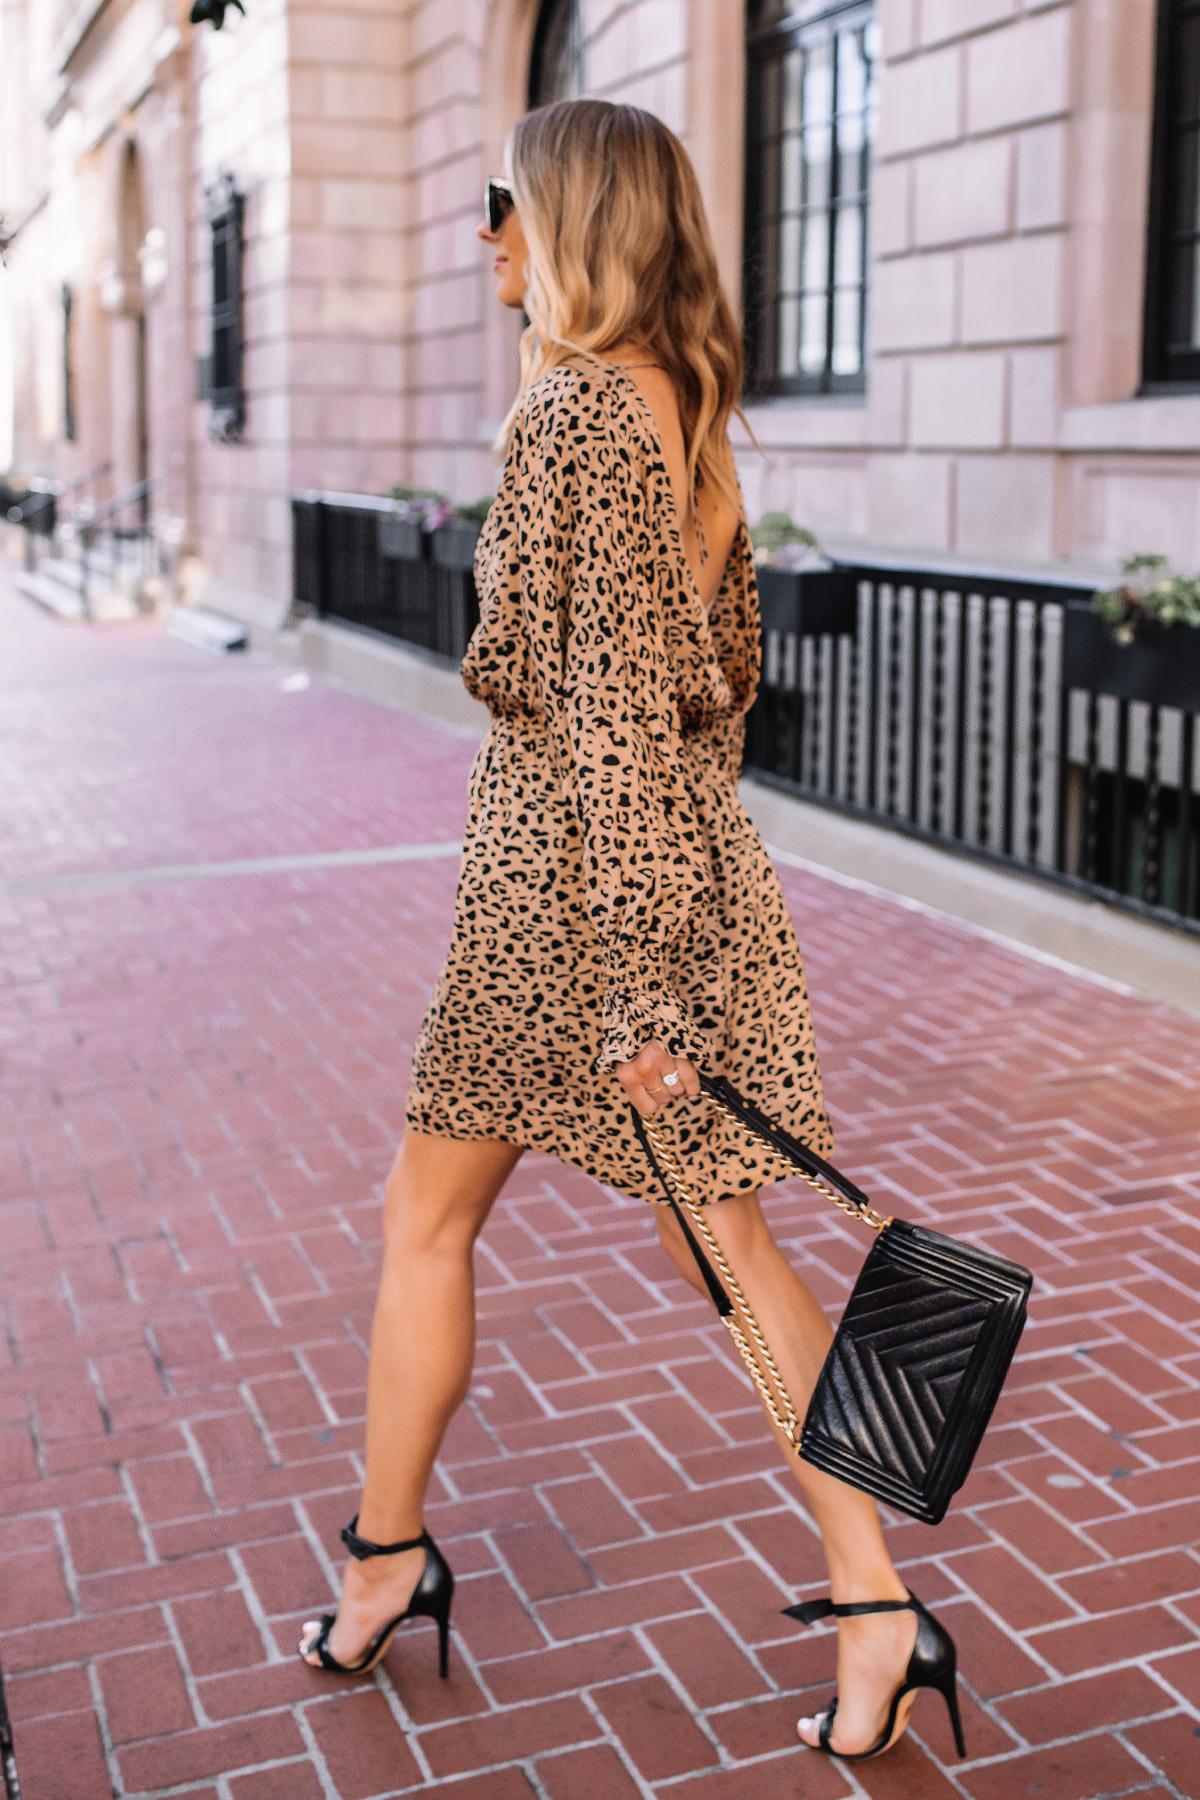 Fashion Jackson Wearing Baum und Pferdgarten Aemiley Drape Leopard Mini Dress Black Heeled Sandals Black Handbag